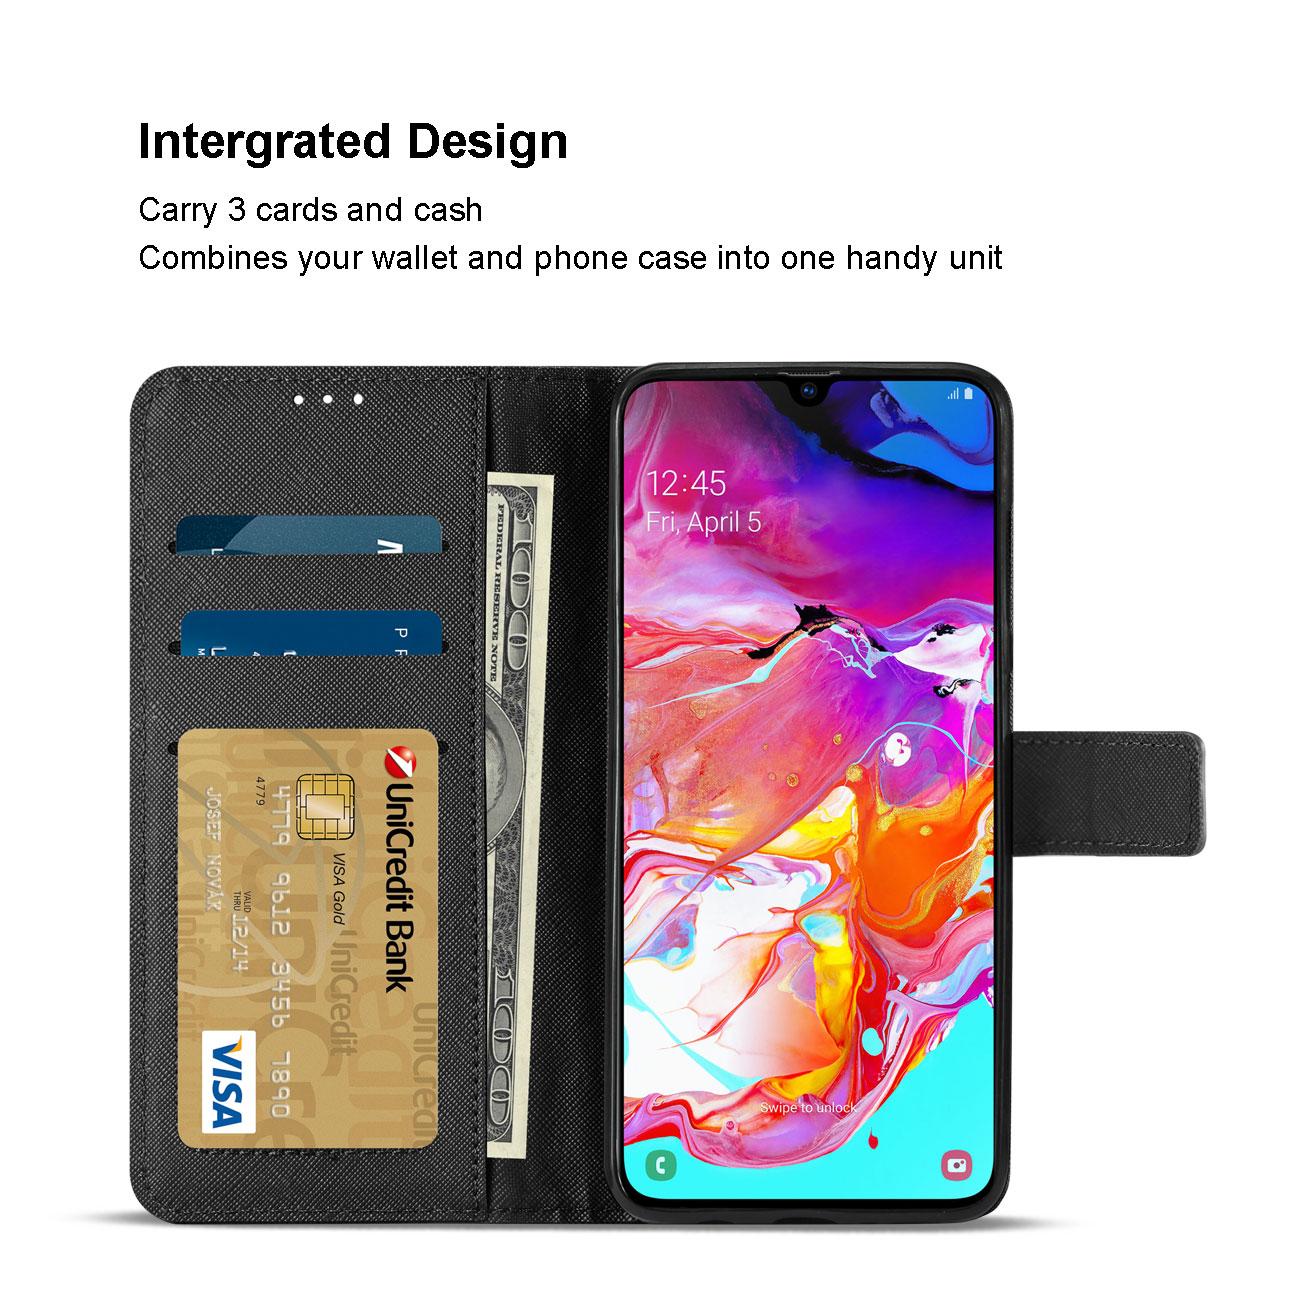 SAMSUNG GALAXY A70 3-In-1 Wallet Case In BLACK